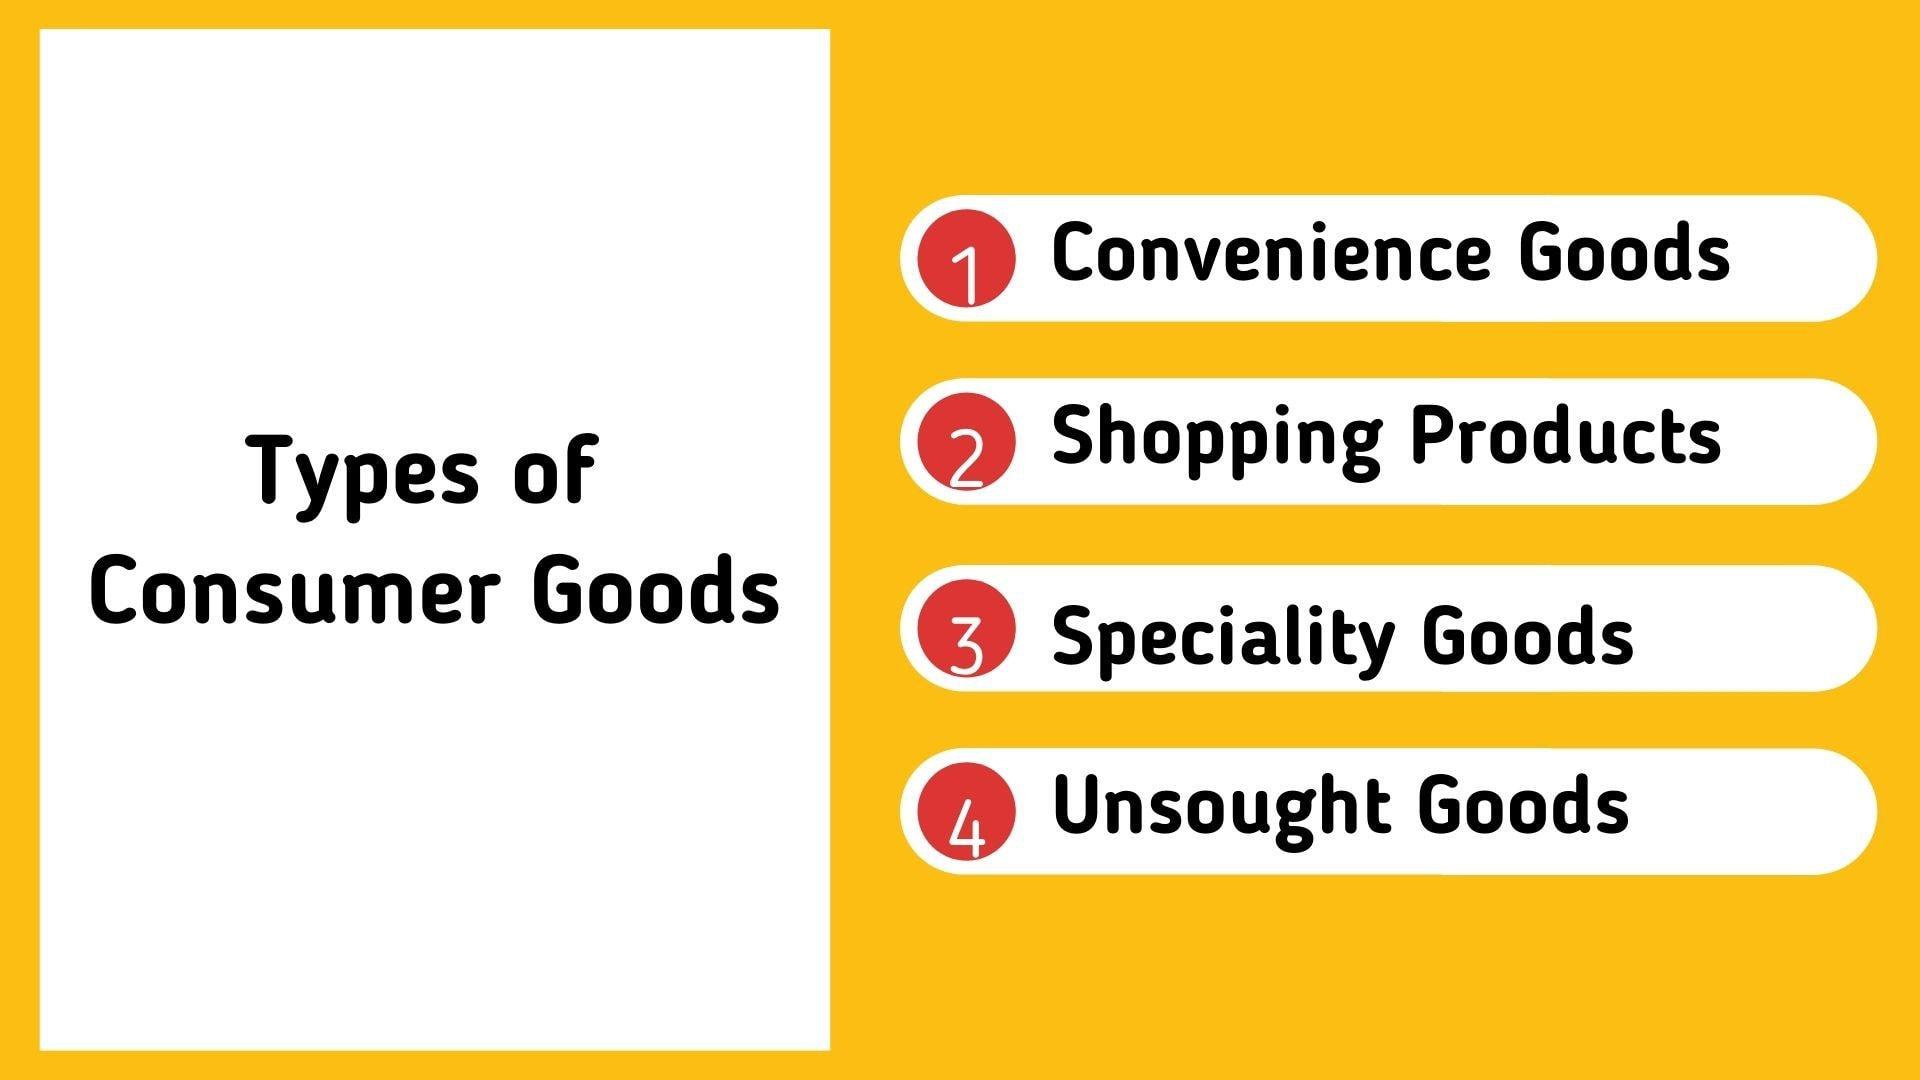 Types of consumer goods